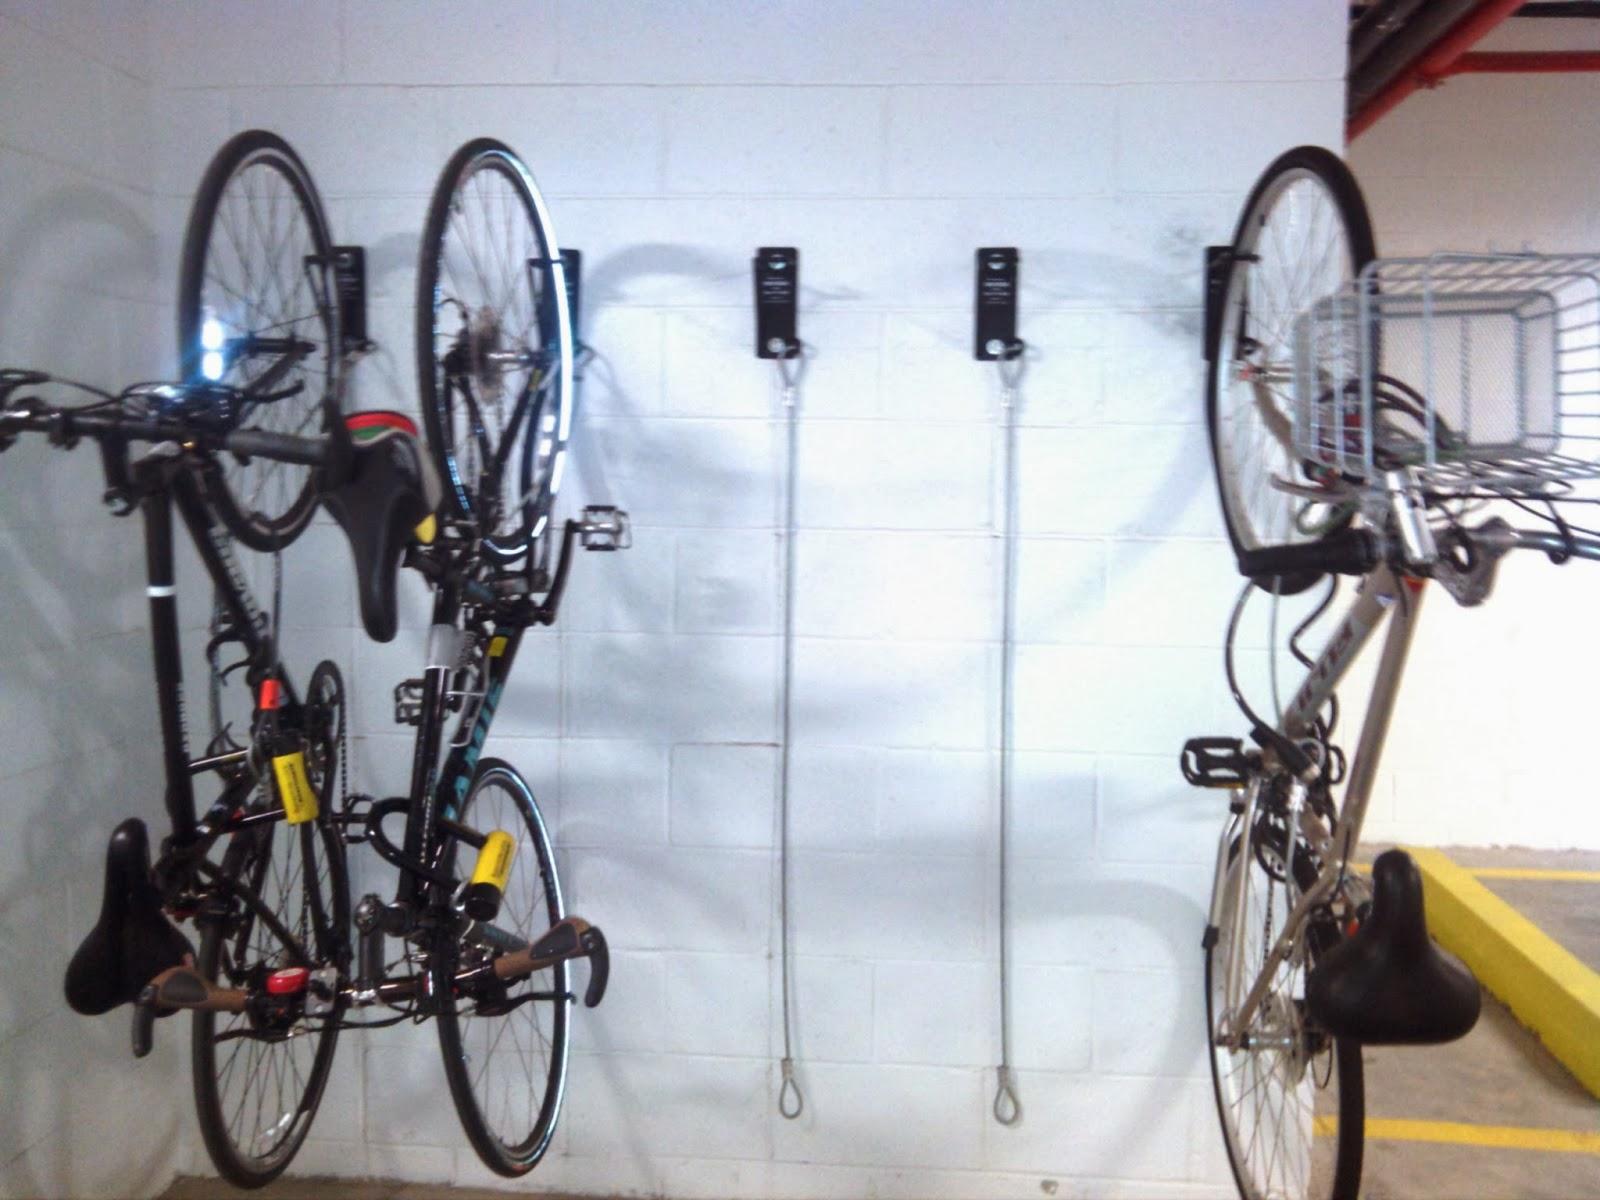 Wall Mount Bike Brackets NYC   NYC Bike Room Solutions ...